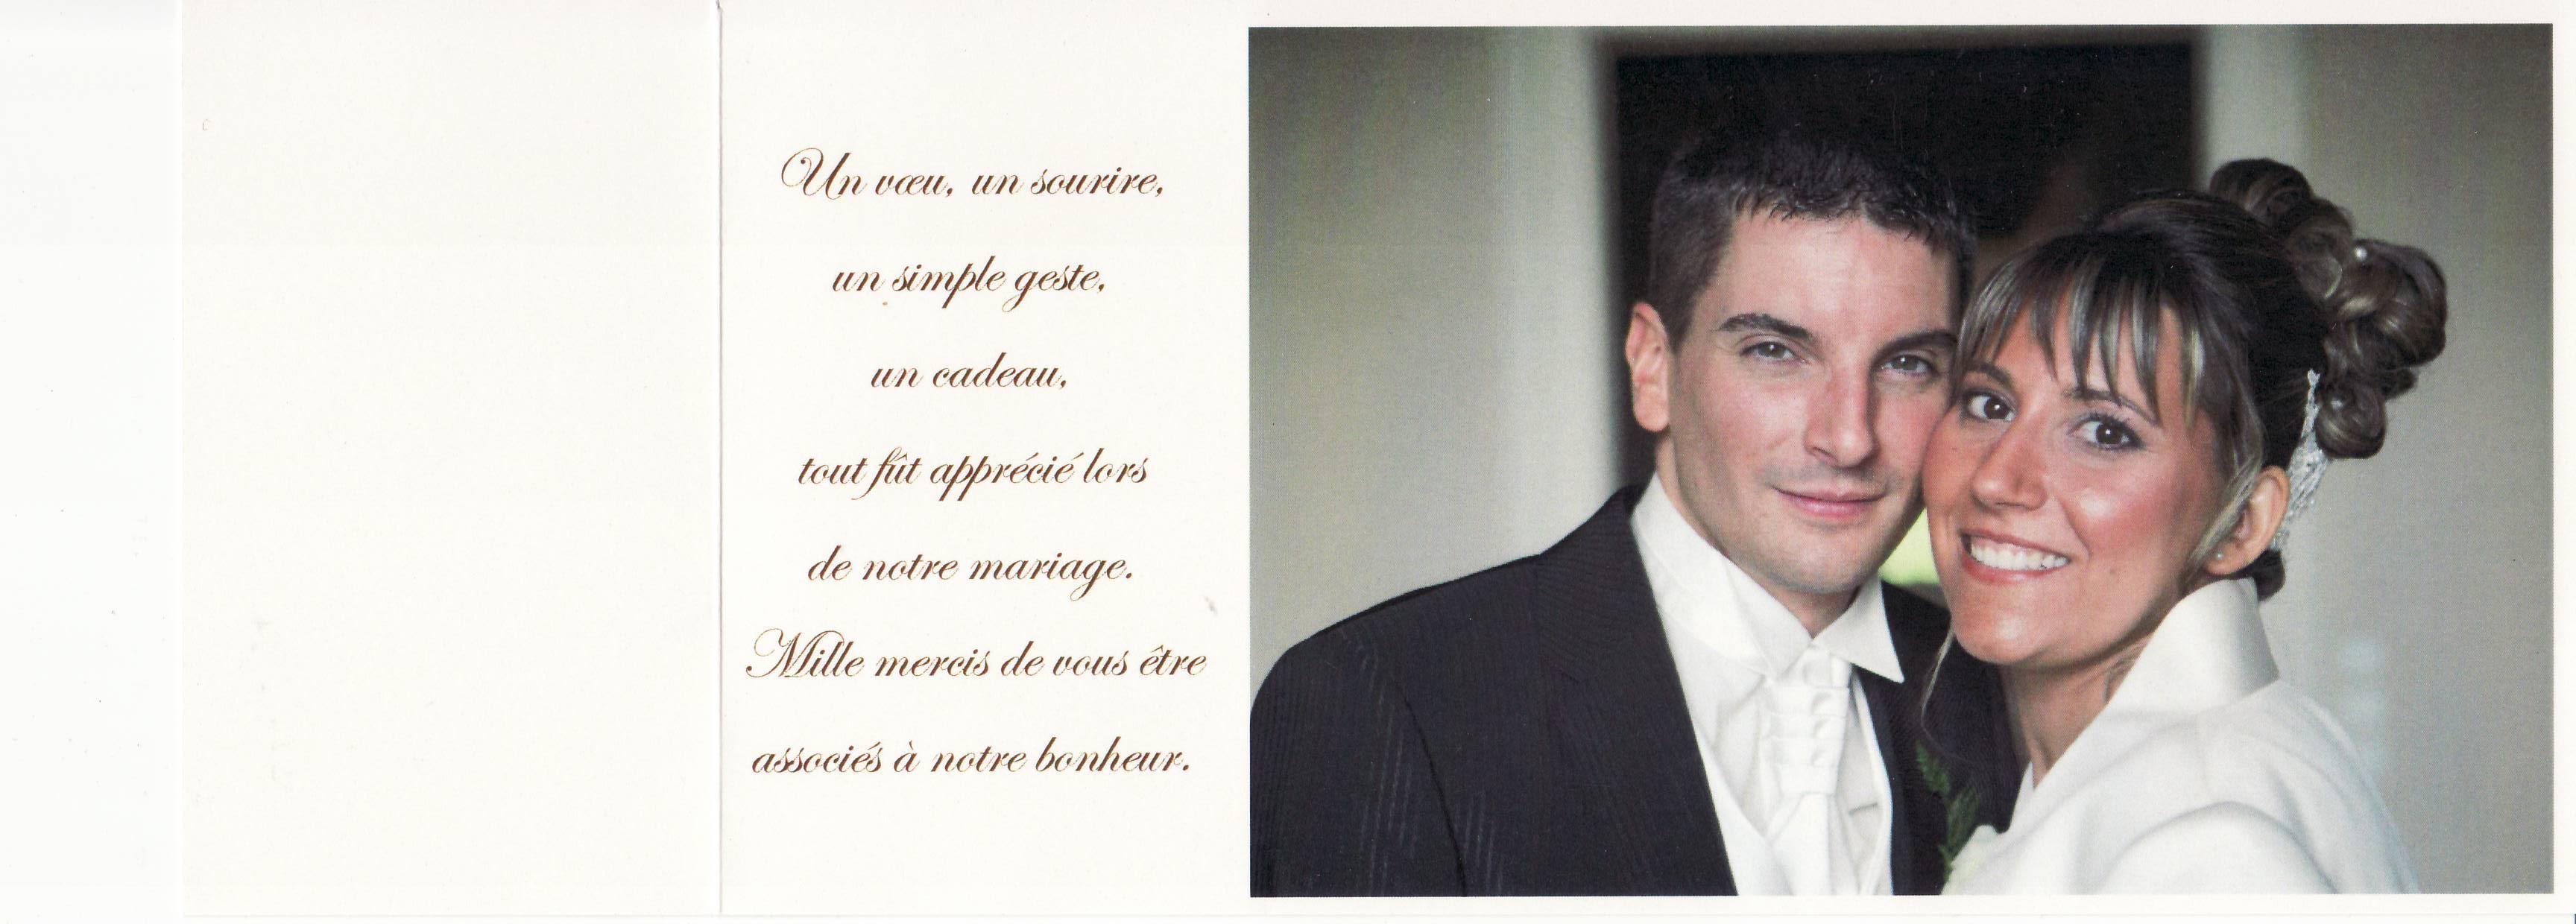 Mariage_MEDER_Yohann_&_Nadège_(Chartreuse_de_Pomier)_(06-10-2012)_1